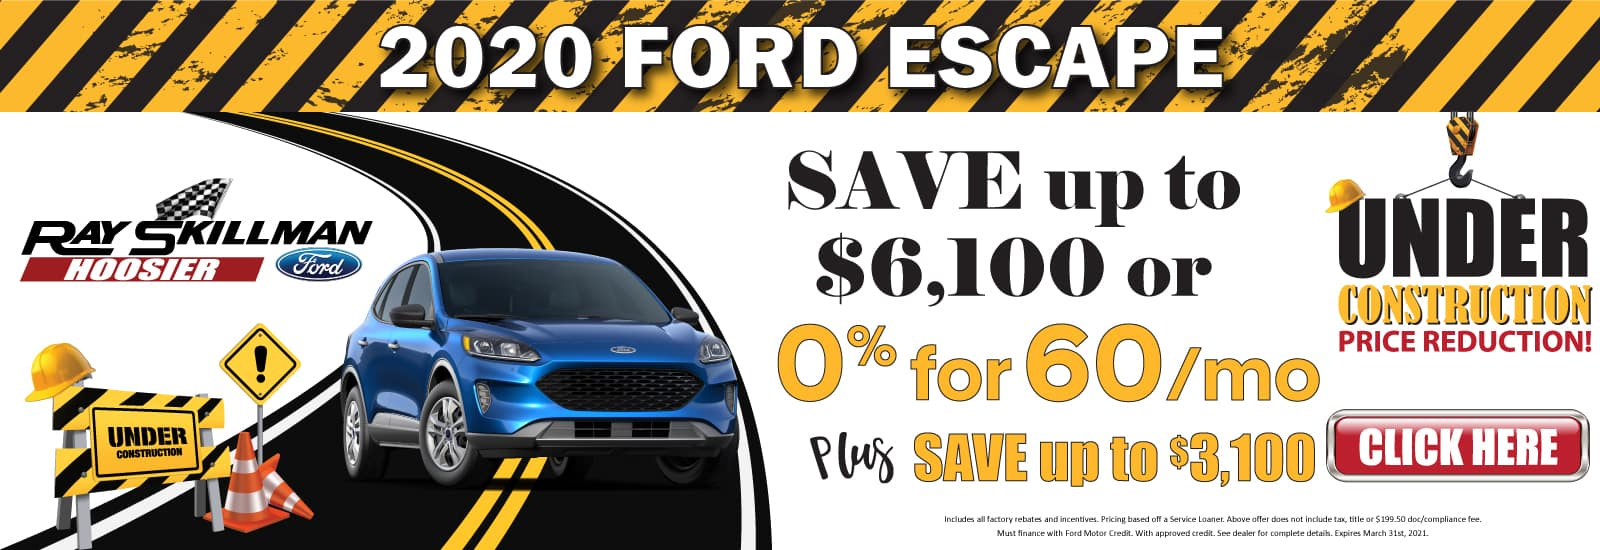 hoosier2020-Ford-Escape-Web-Banner-1600×550